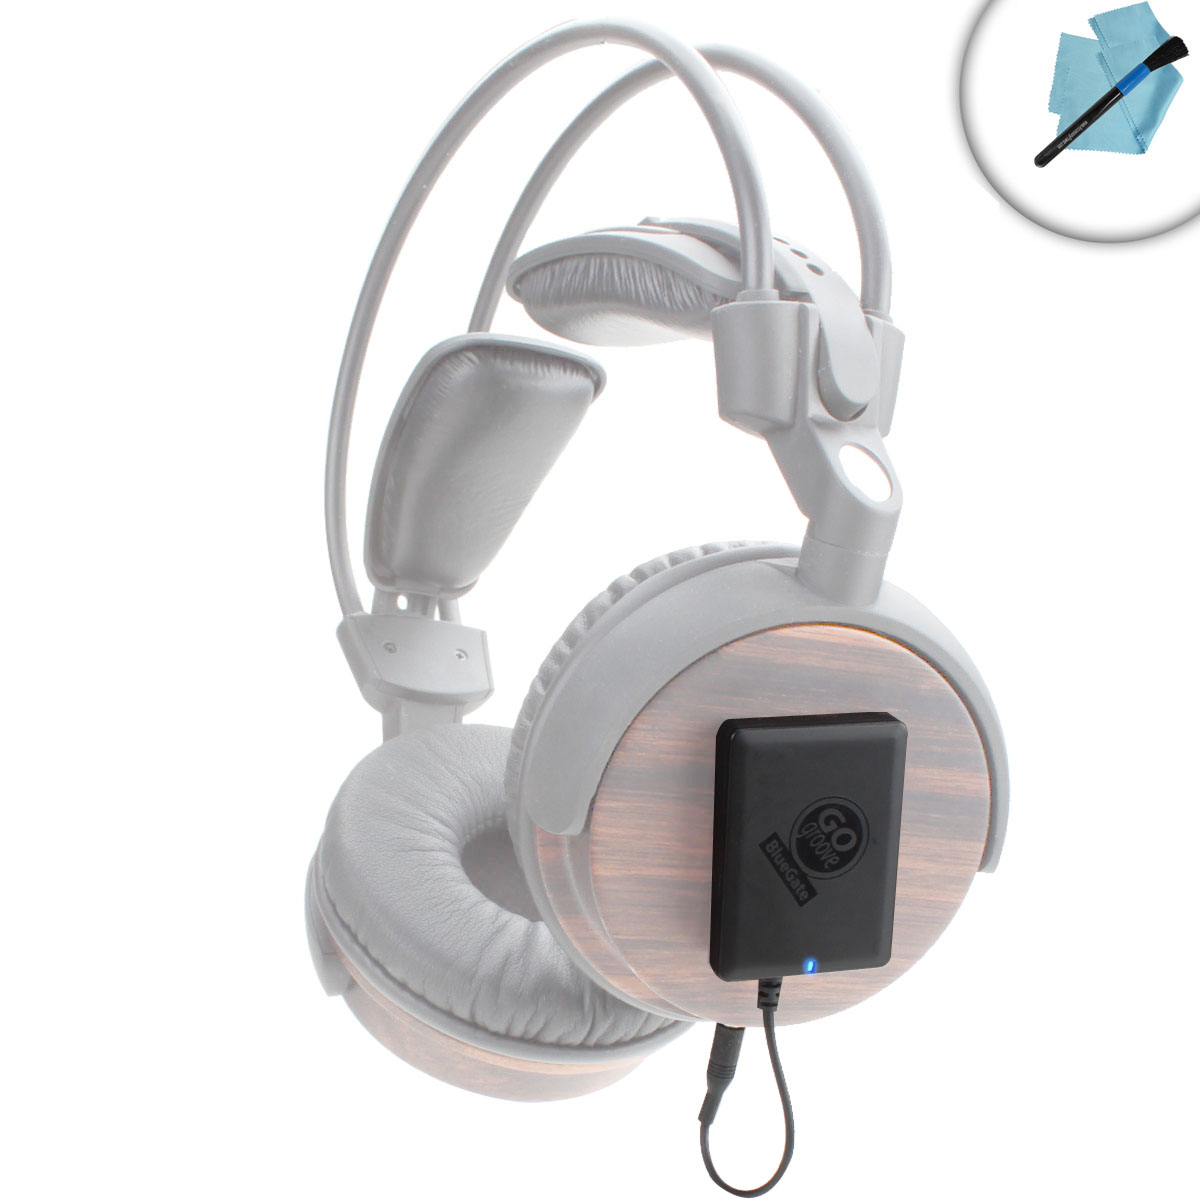 Earphone sport bluetooth beats - bluetooth headphone adapter beats pro